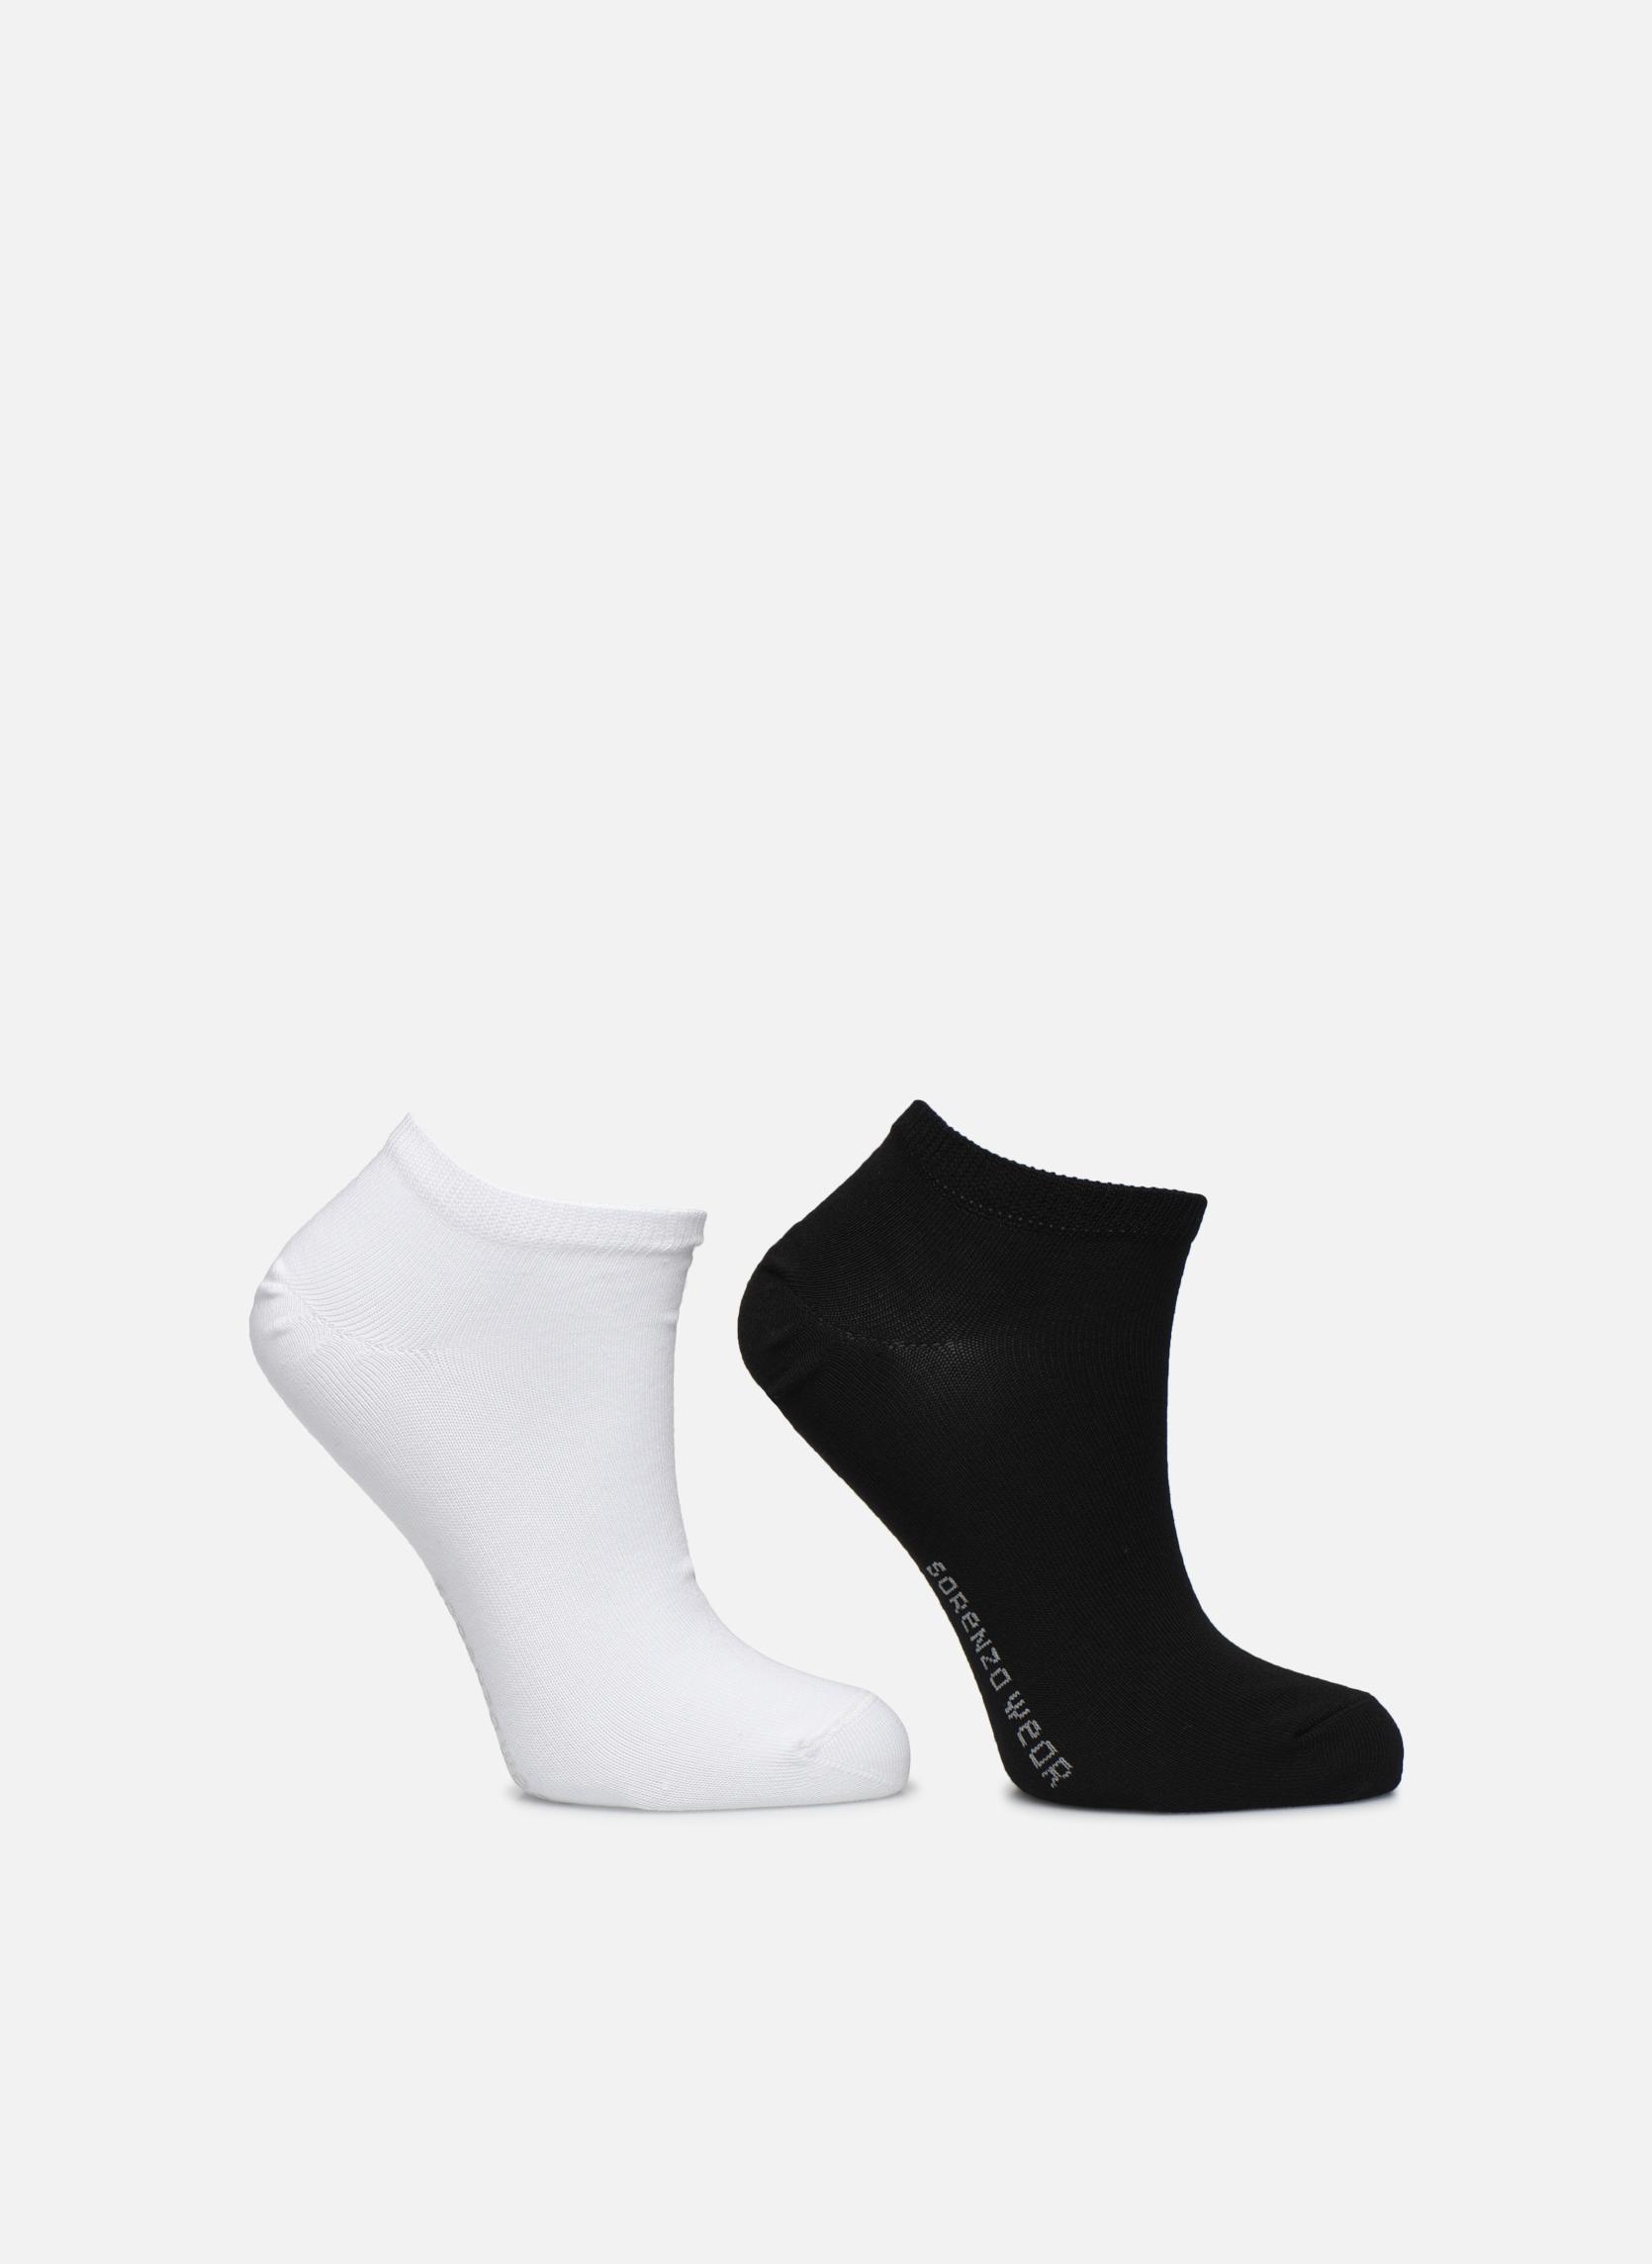 Transparente Socken unies 2er-Pack Noir/blanc